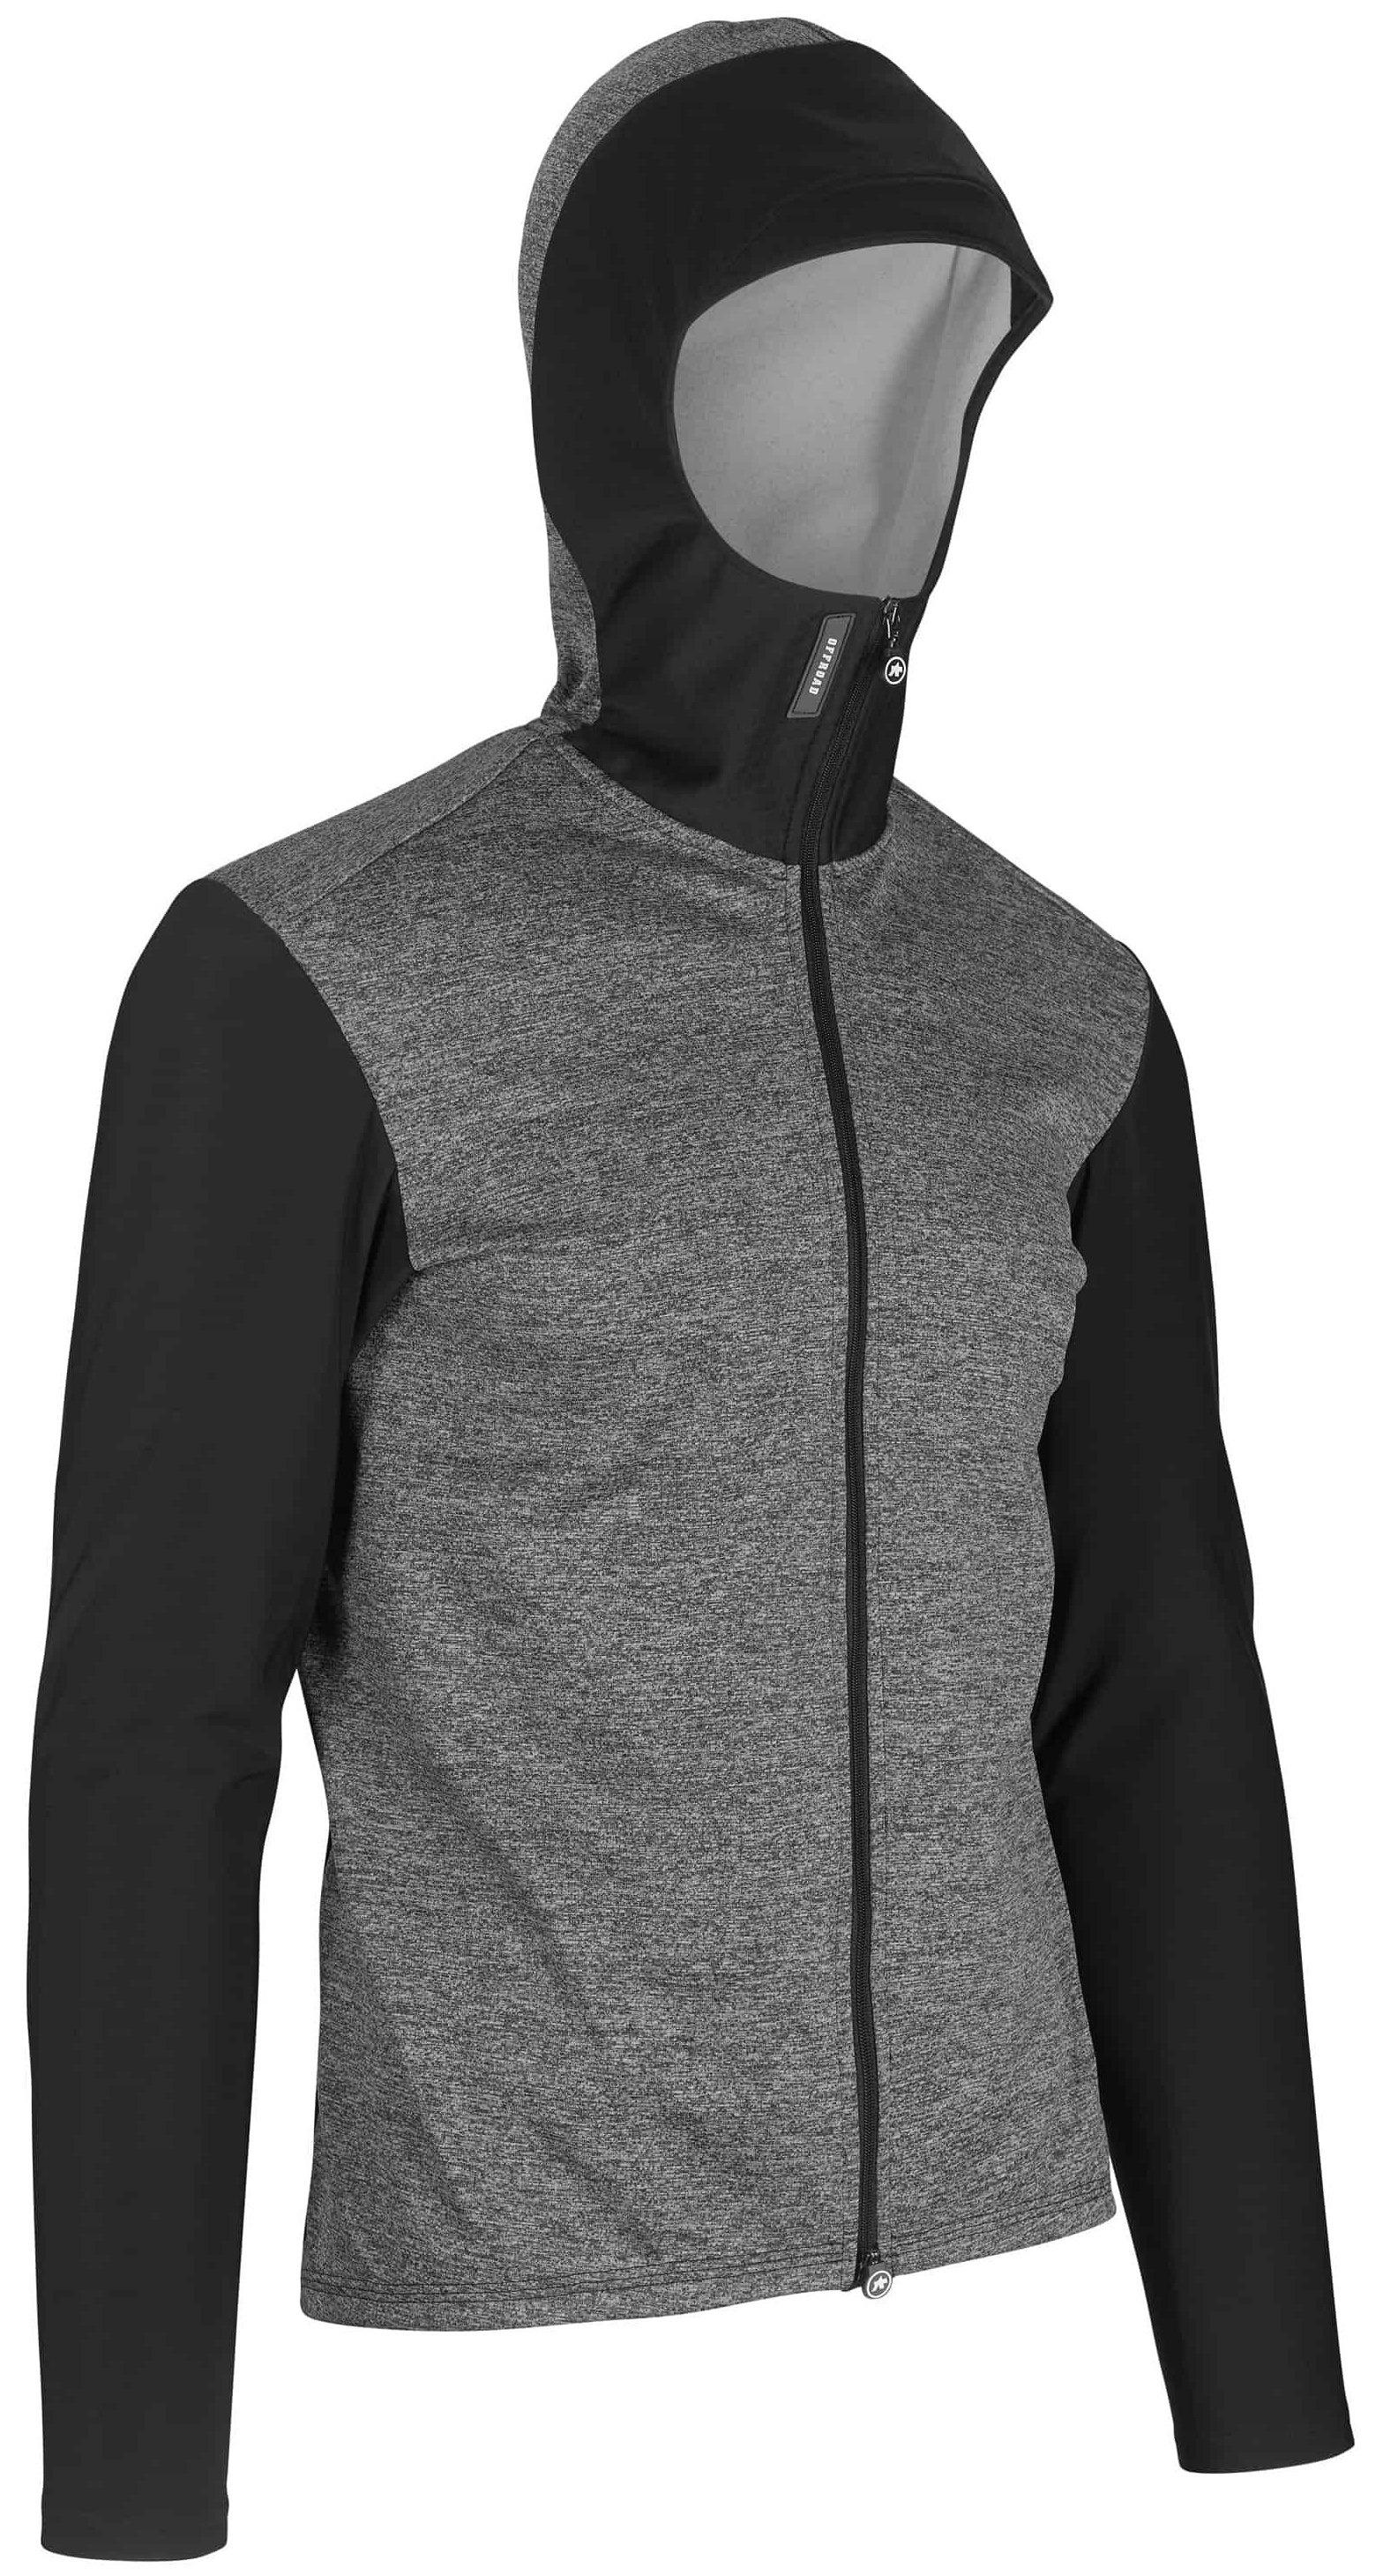 Assos Jakke TRAIL Spring/Fall Hooded Jacket Men